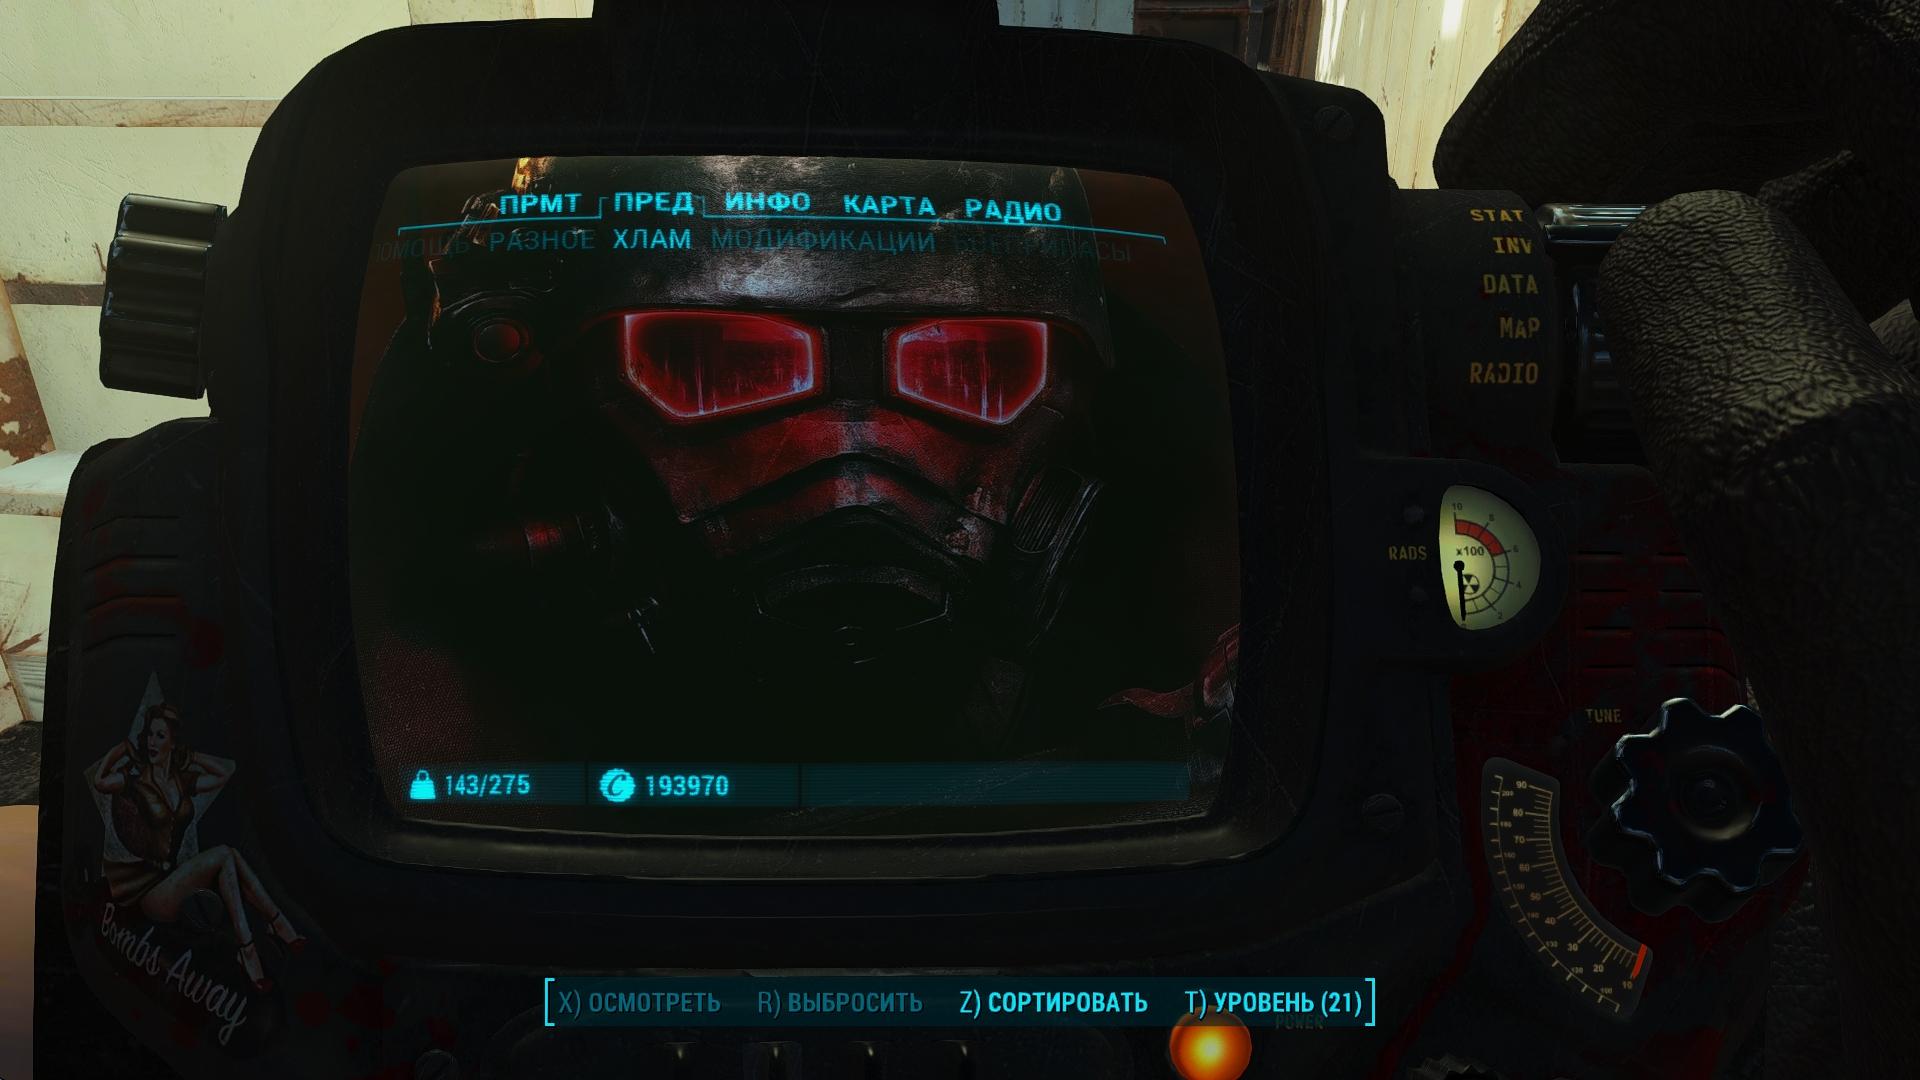 00040.Jpg - Fallout 4